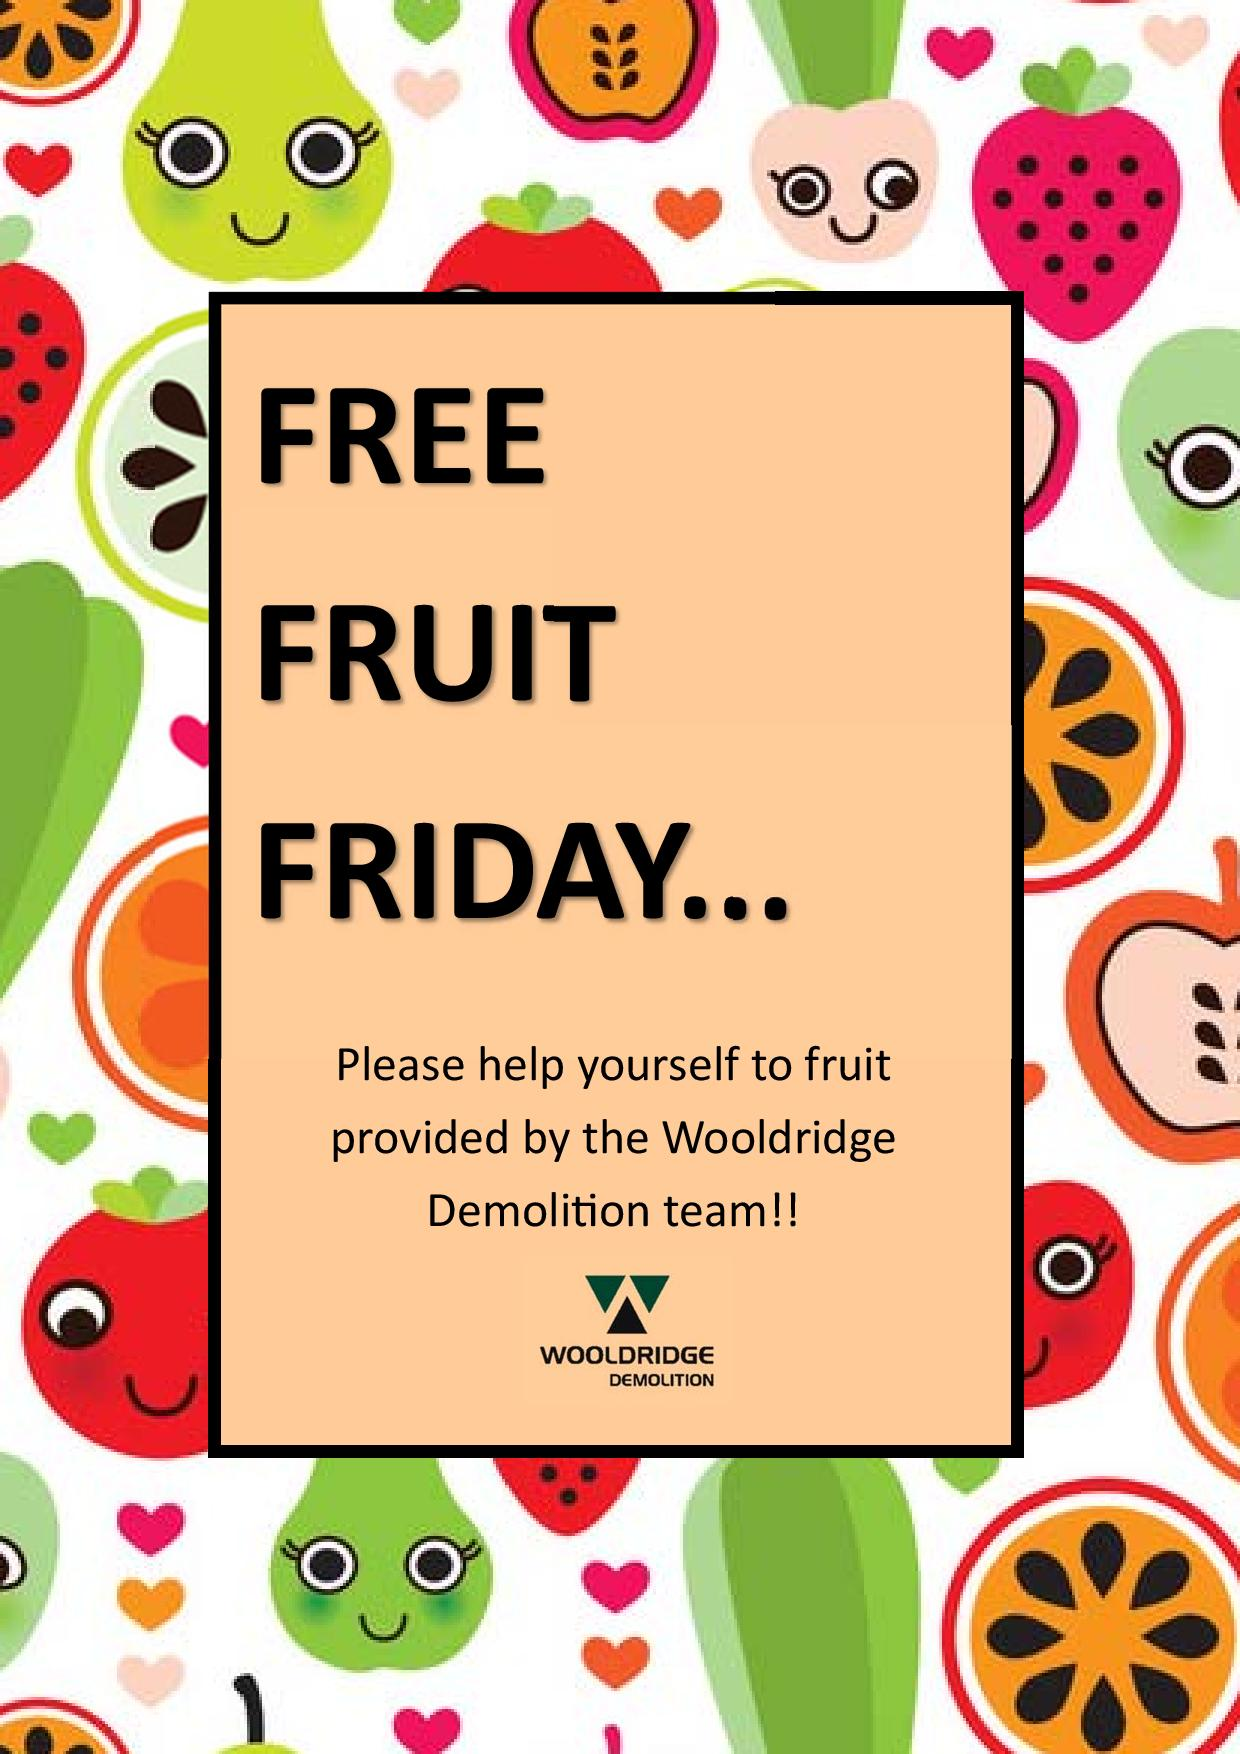 free fruit friday best practice hub